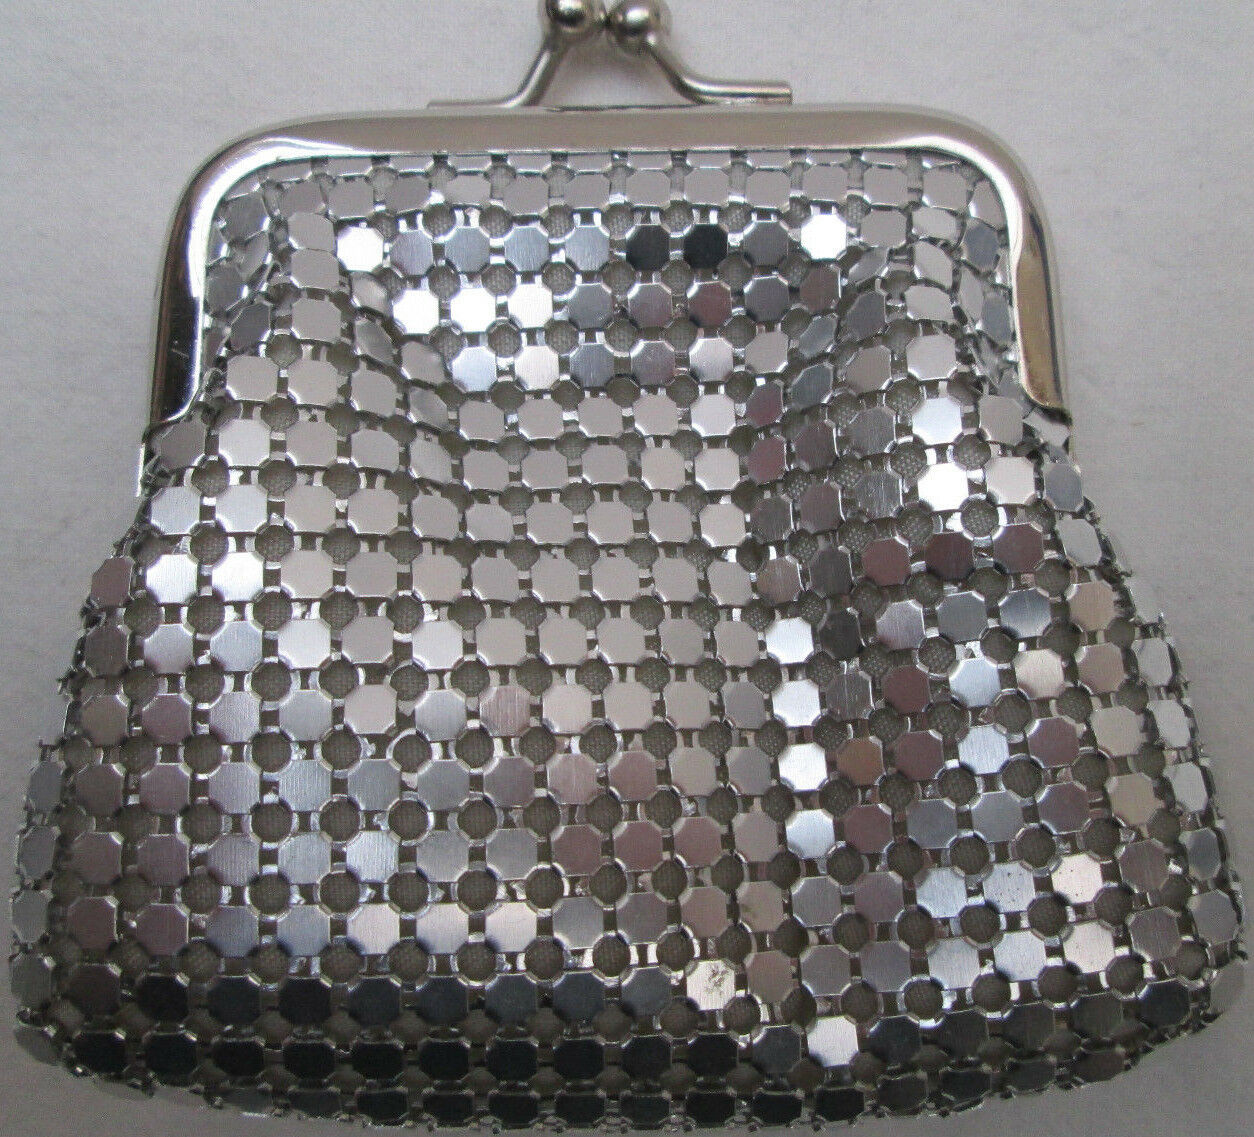 - nice purses silver clipsé tbeg vintage